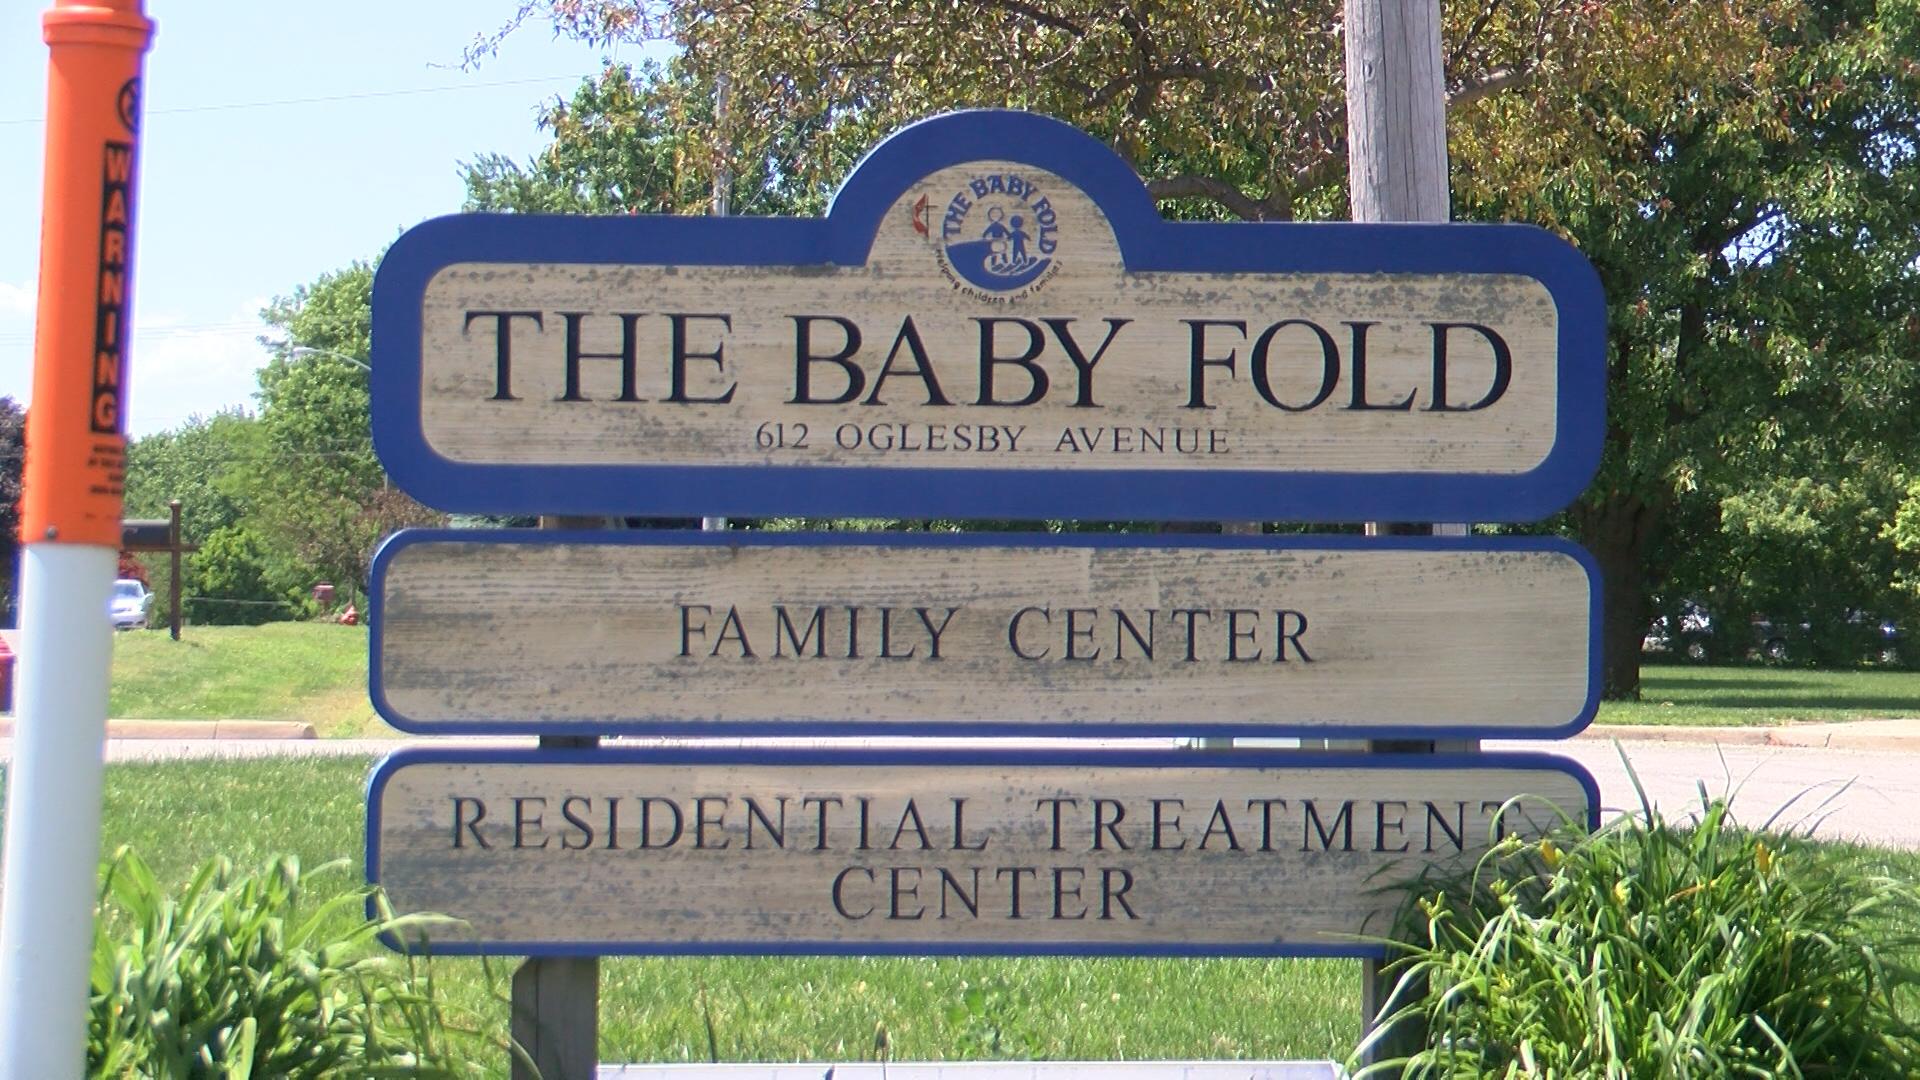 Baby Fold_1496706923766.jpg